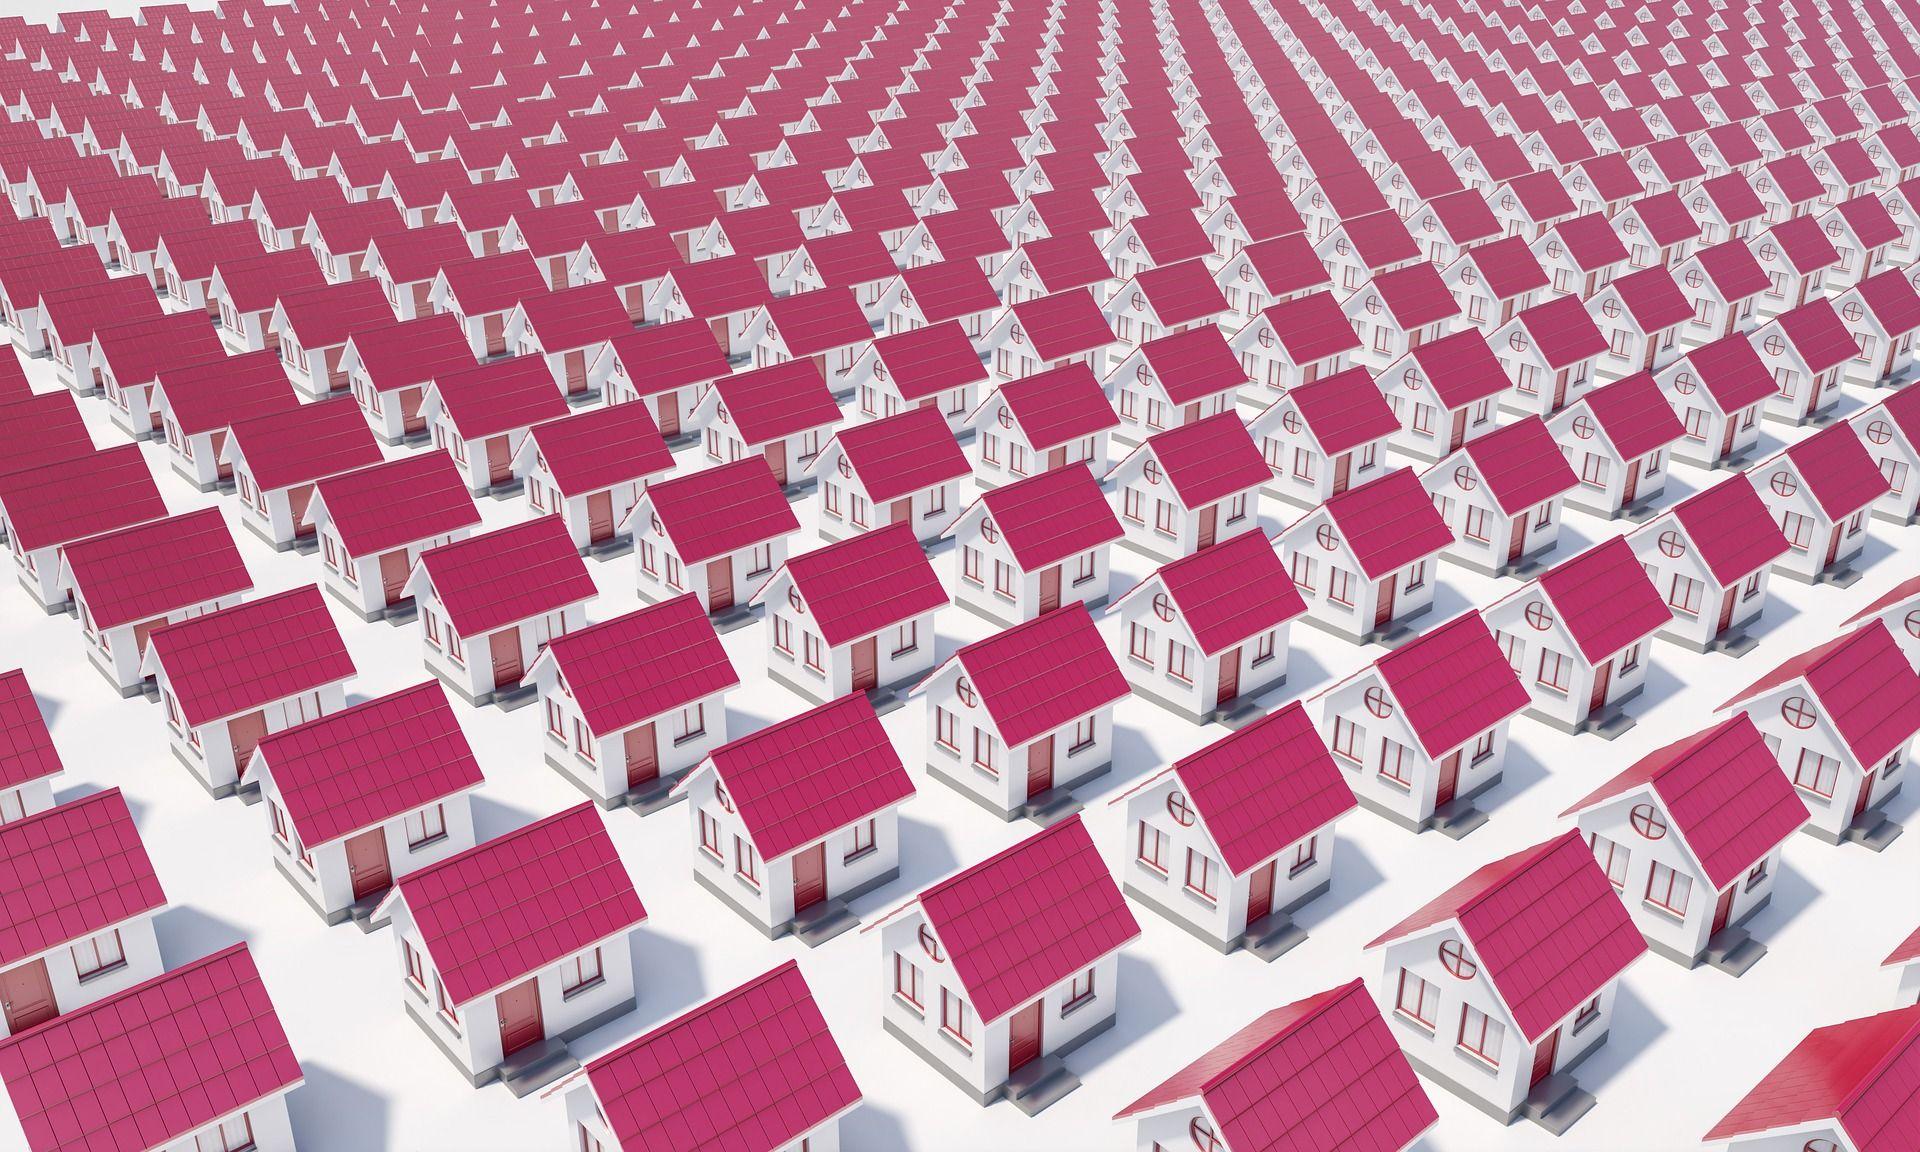 real-estate-3868287_1920.jpg